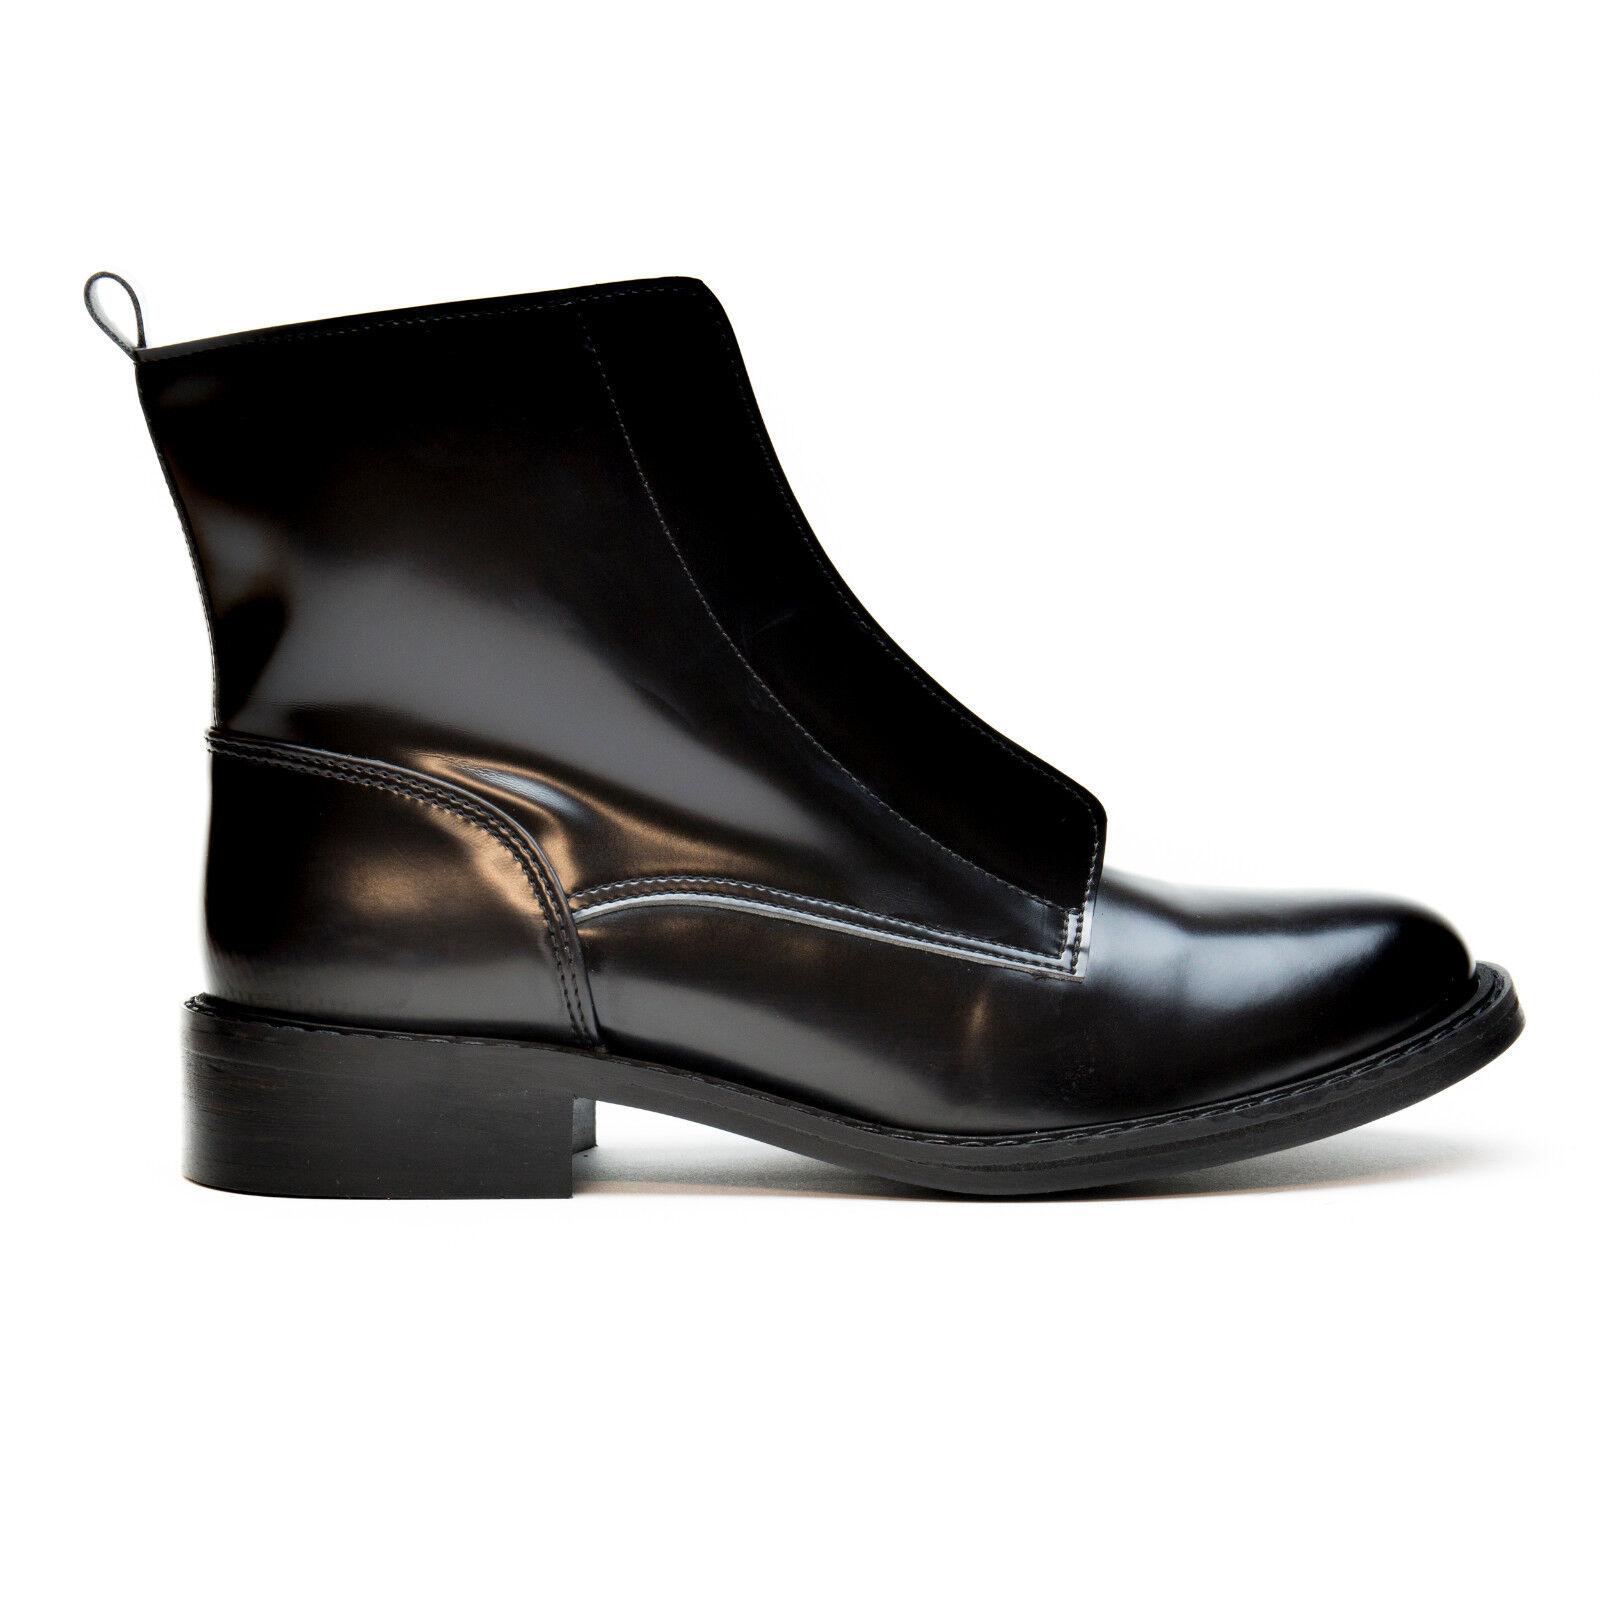 Vegan ankle boots woman black zip flat heel round-toe breathable water-resistant